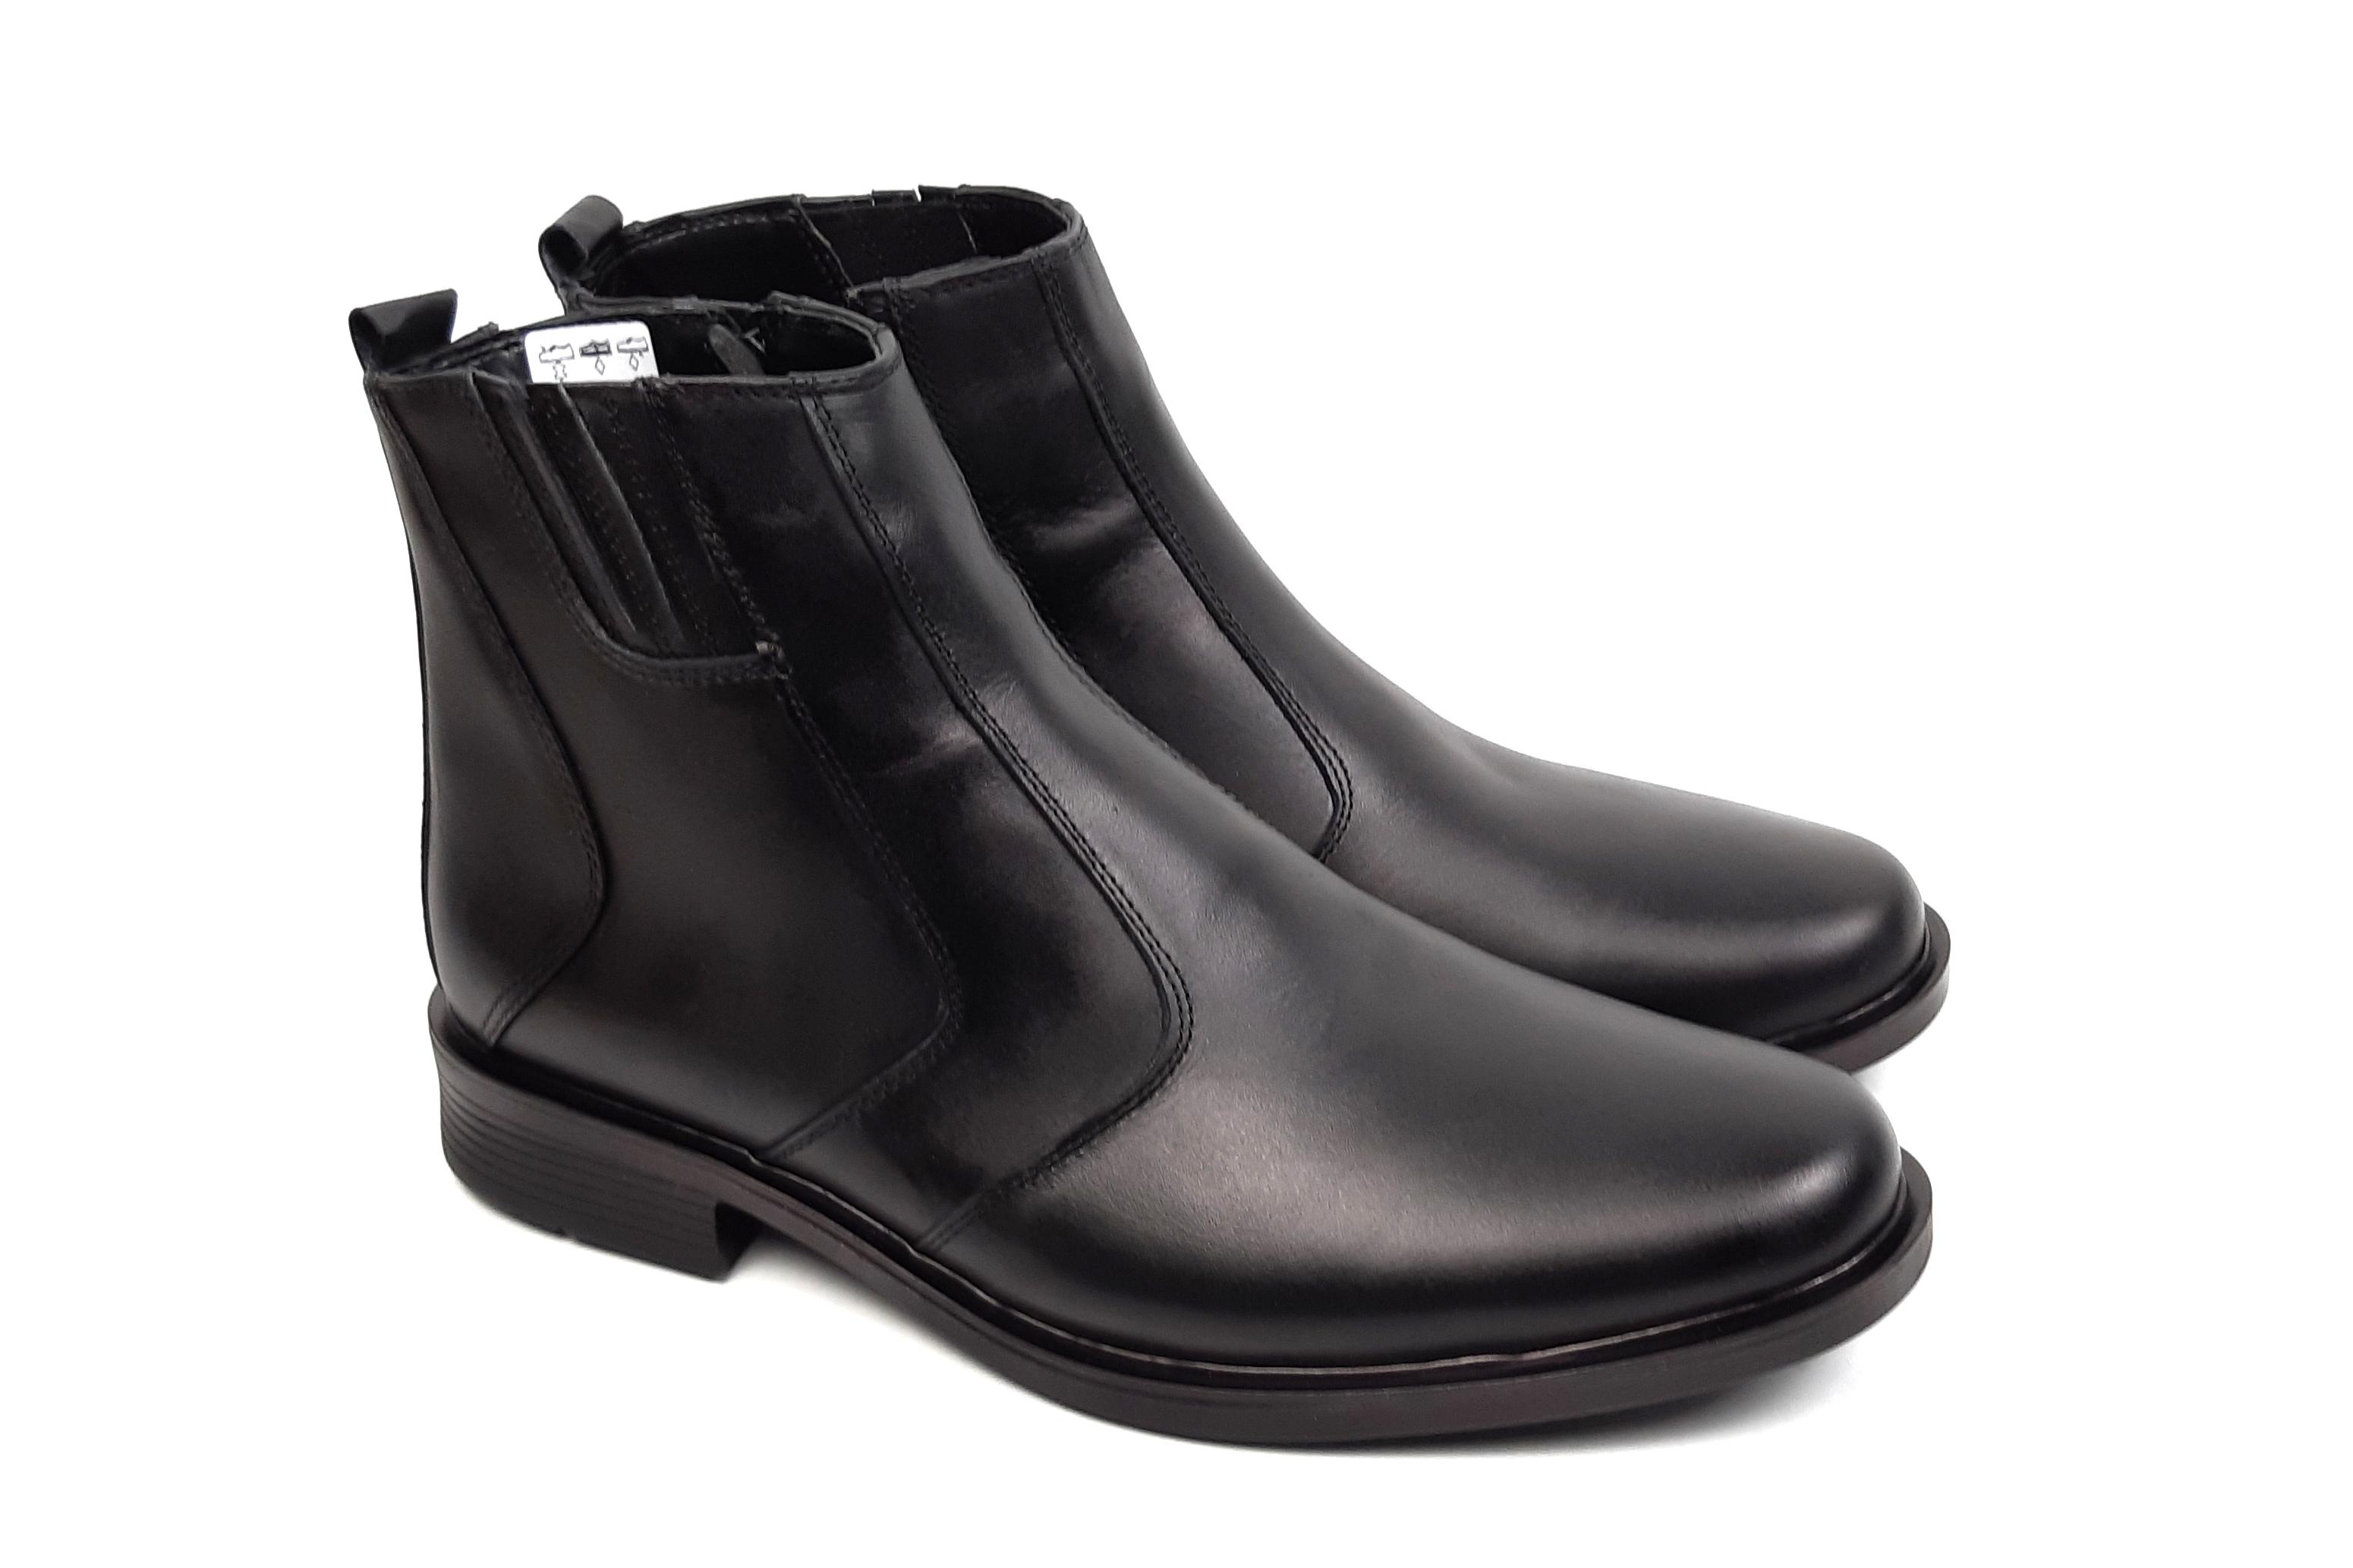 Ghete barbati casual negre - elegante, din piele naturala, cu fermoar - LYON30N